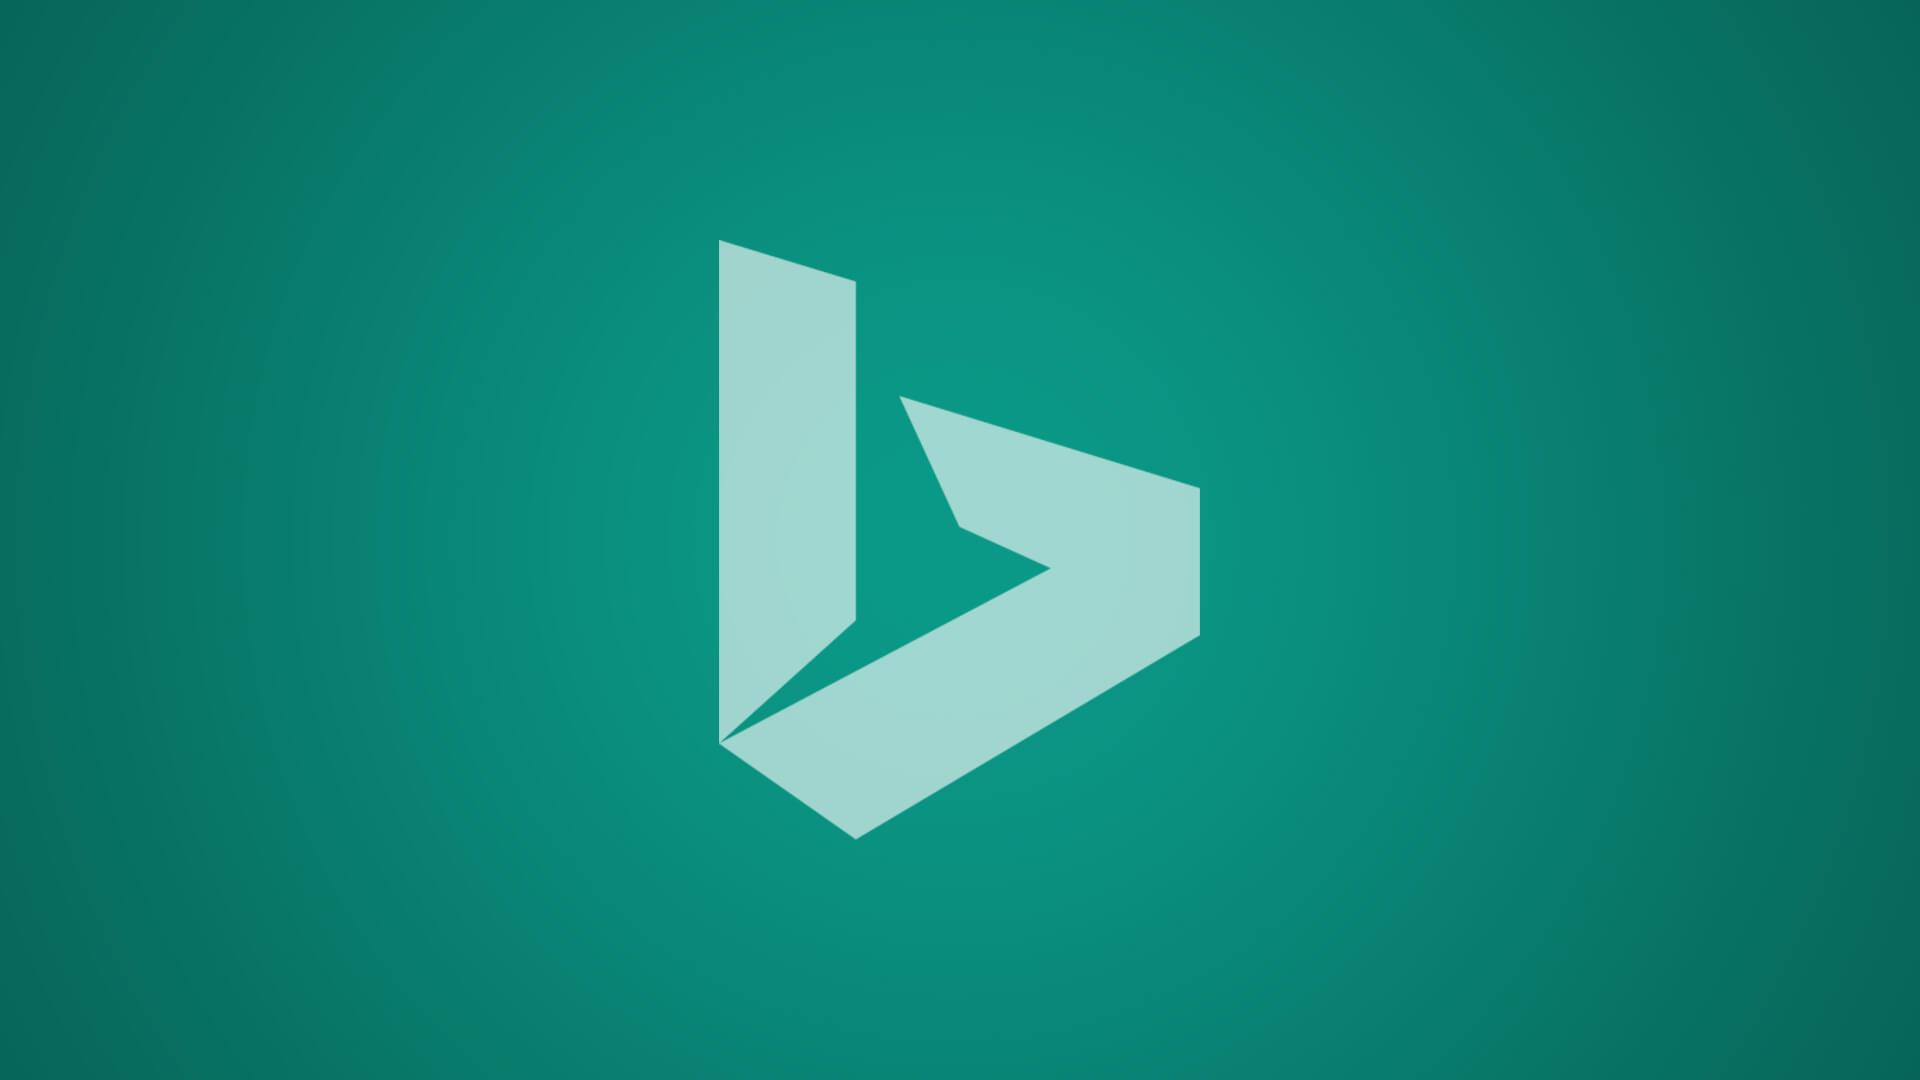 Bing Ads' new Audience Segmentation feature makes list performance comparisons a breeze